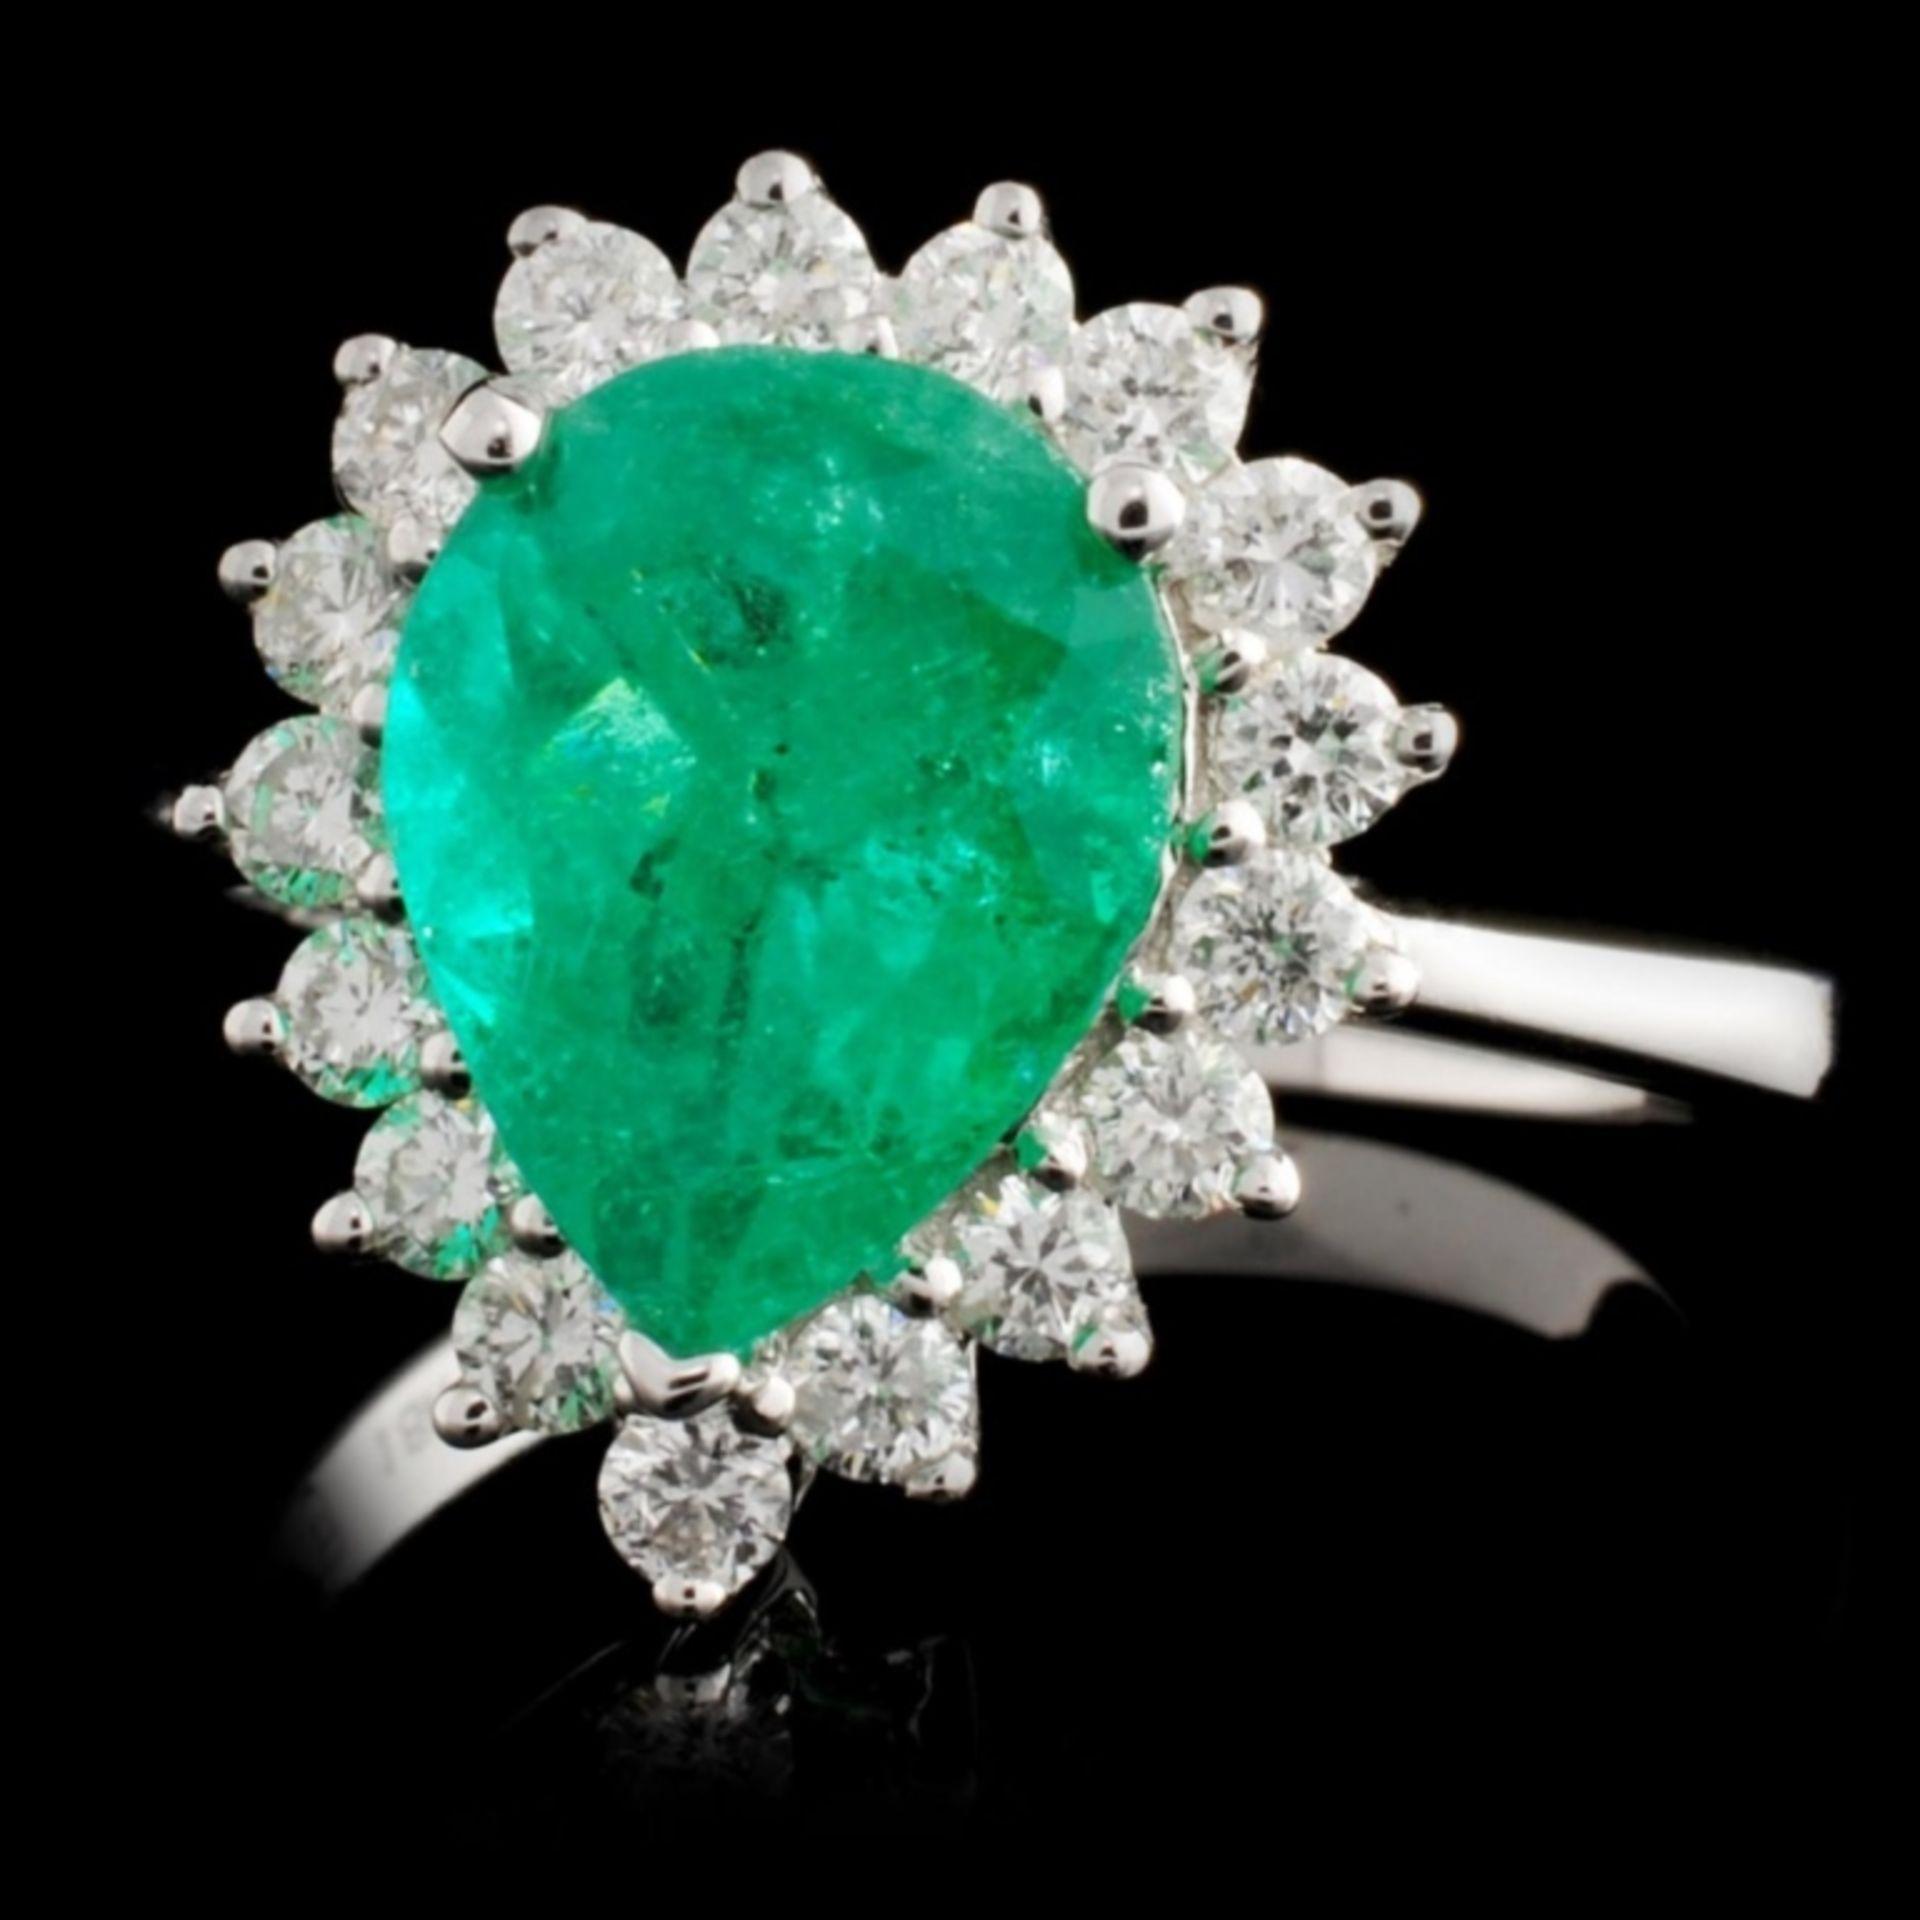 18K White Gold 2.32ct Emerald & 0.56ct Diamond Rin - Image 2 of 4